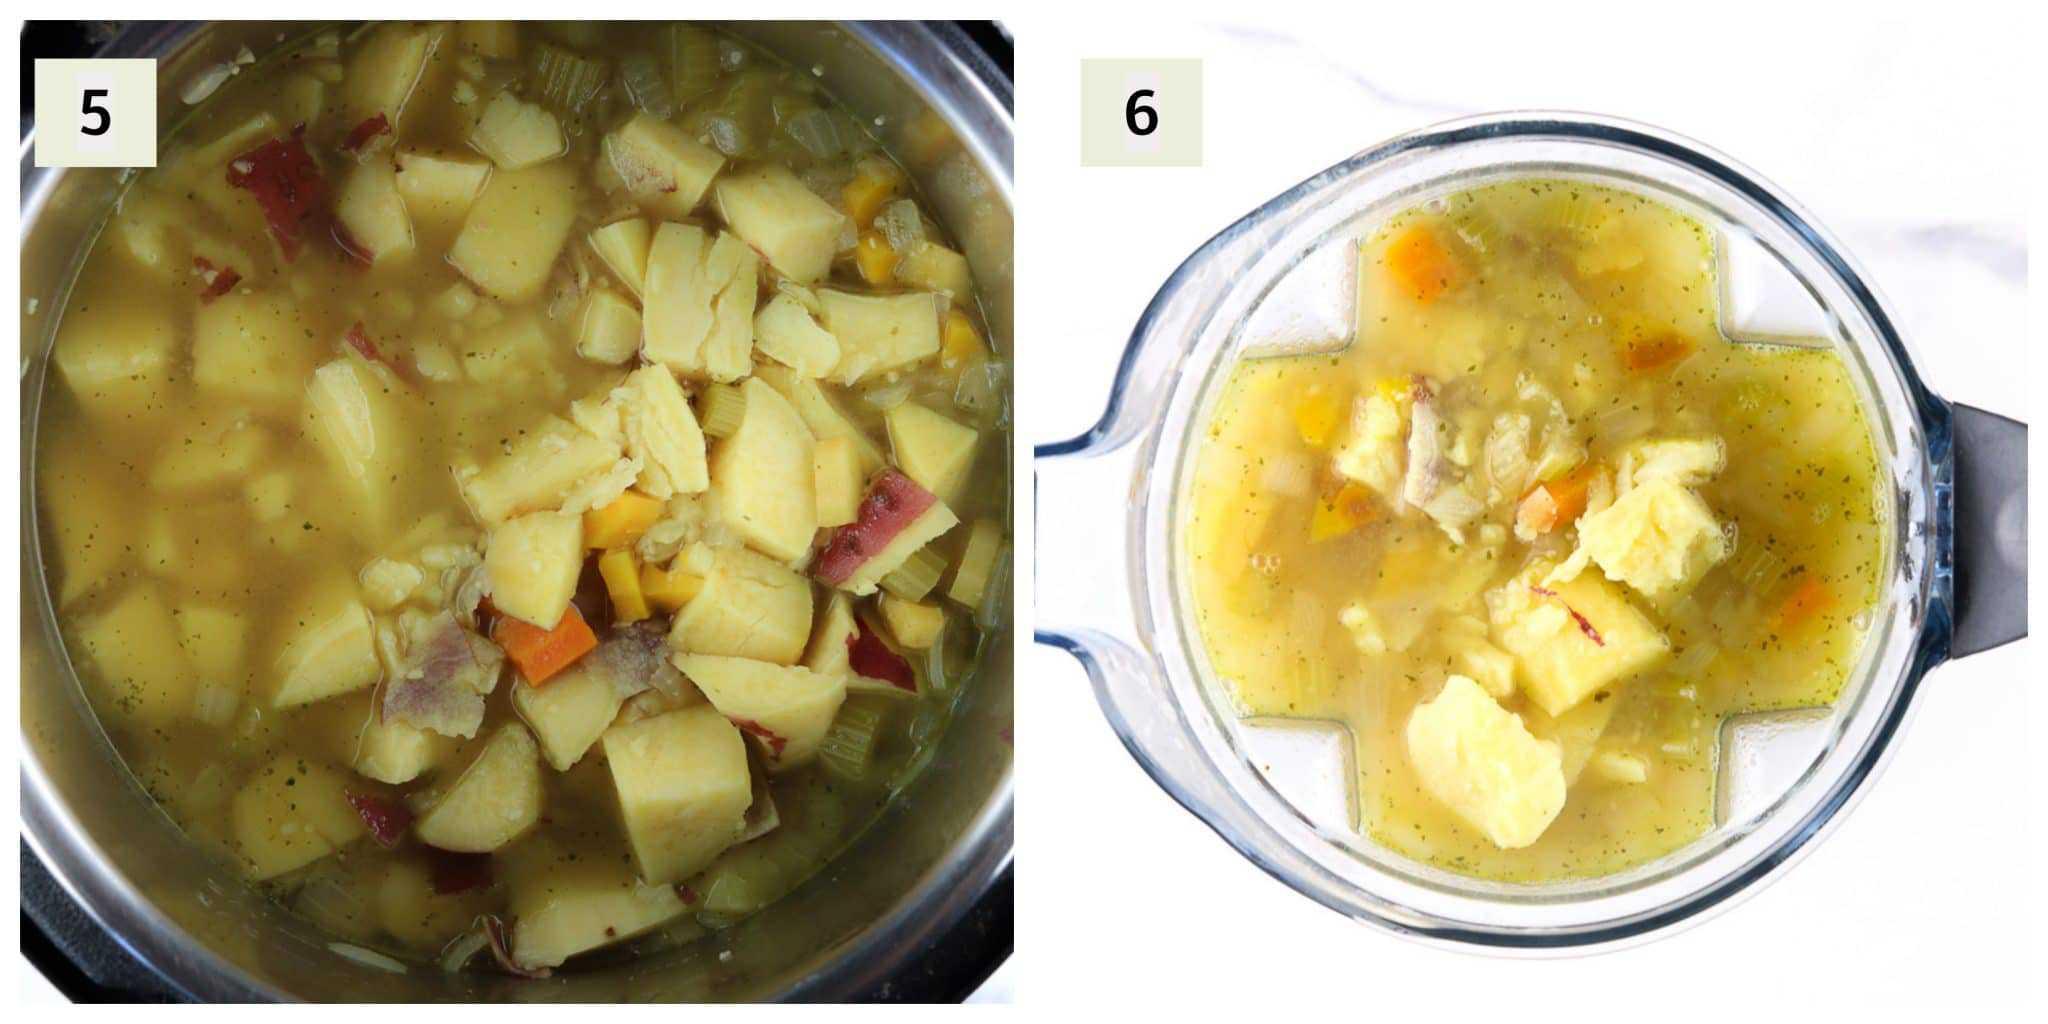 Process shots to make soup.